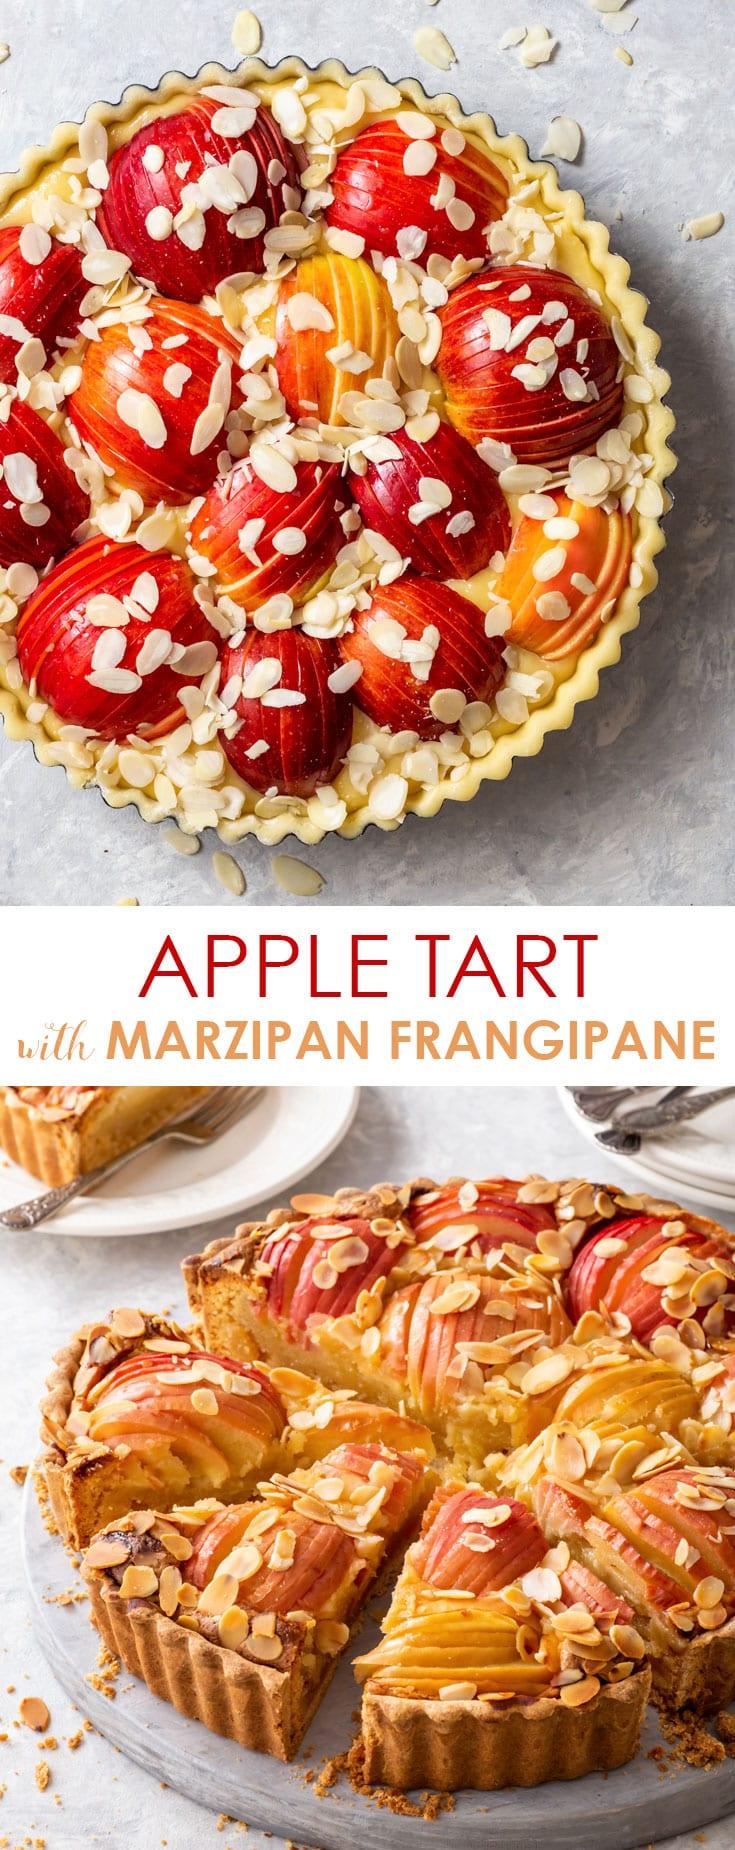 Pinterest image for apple tart with marzipan frangipane.